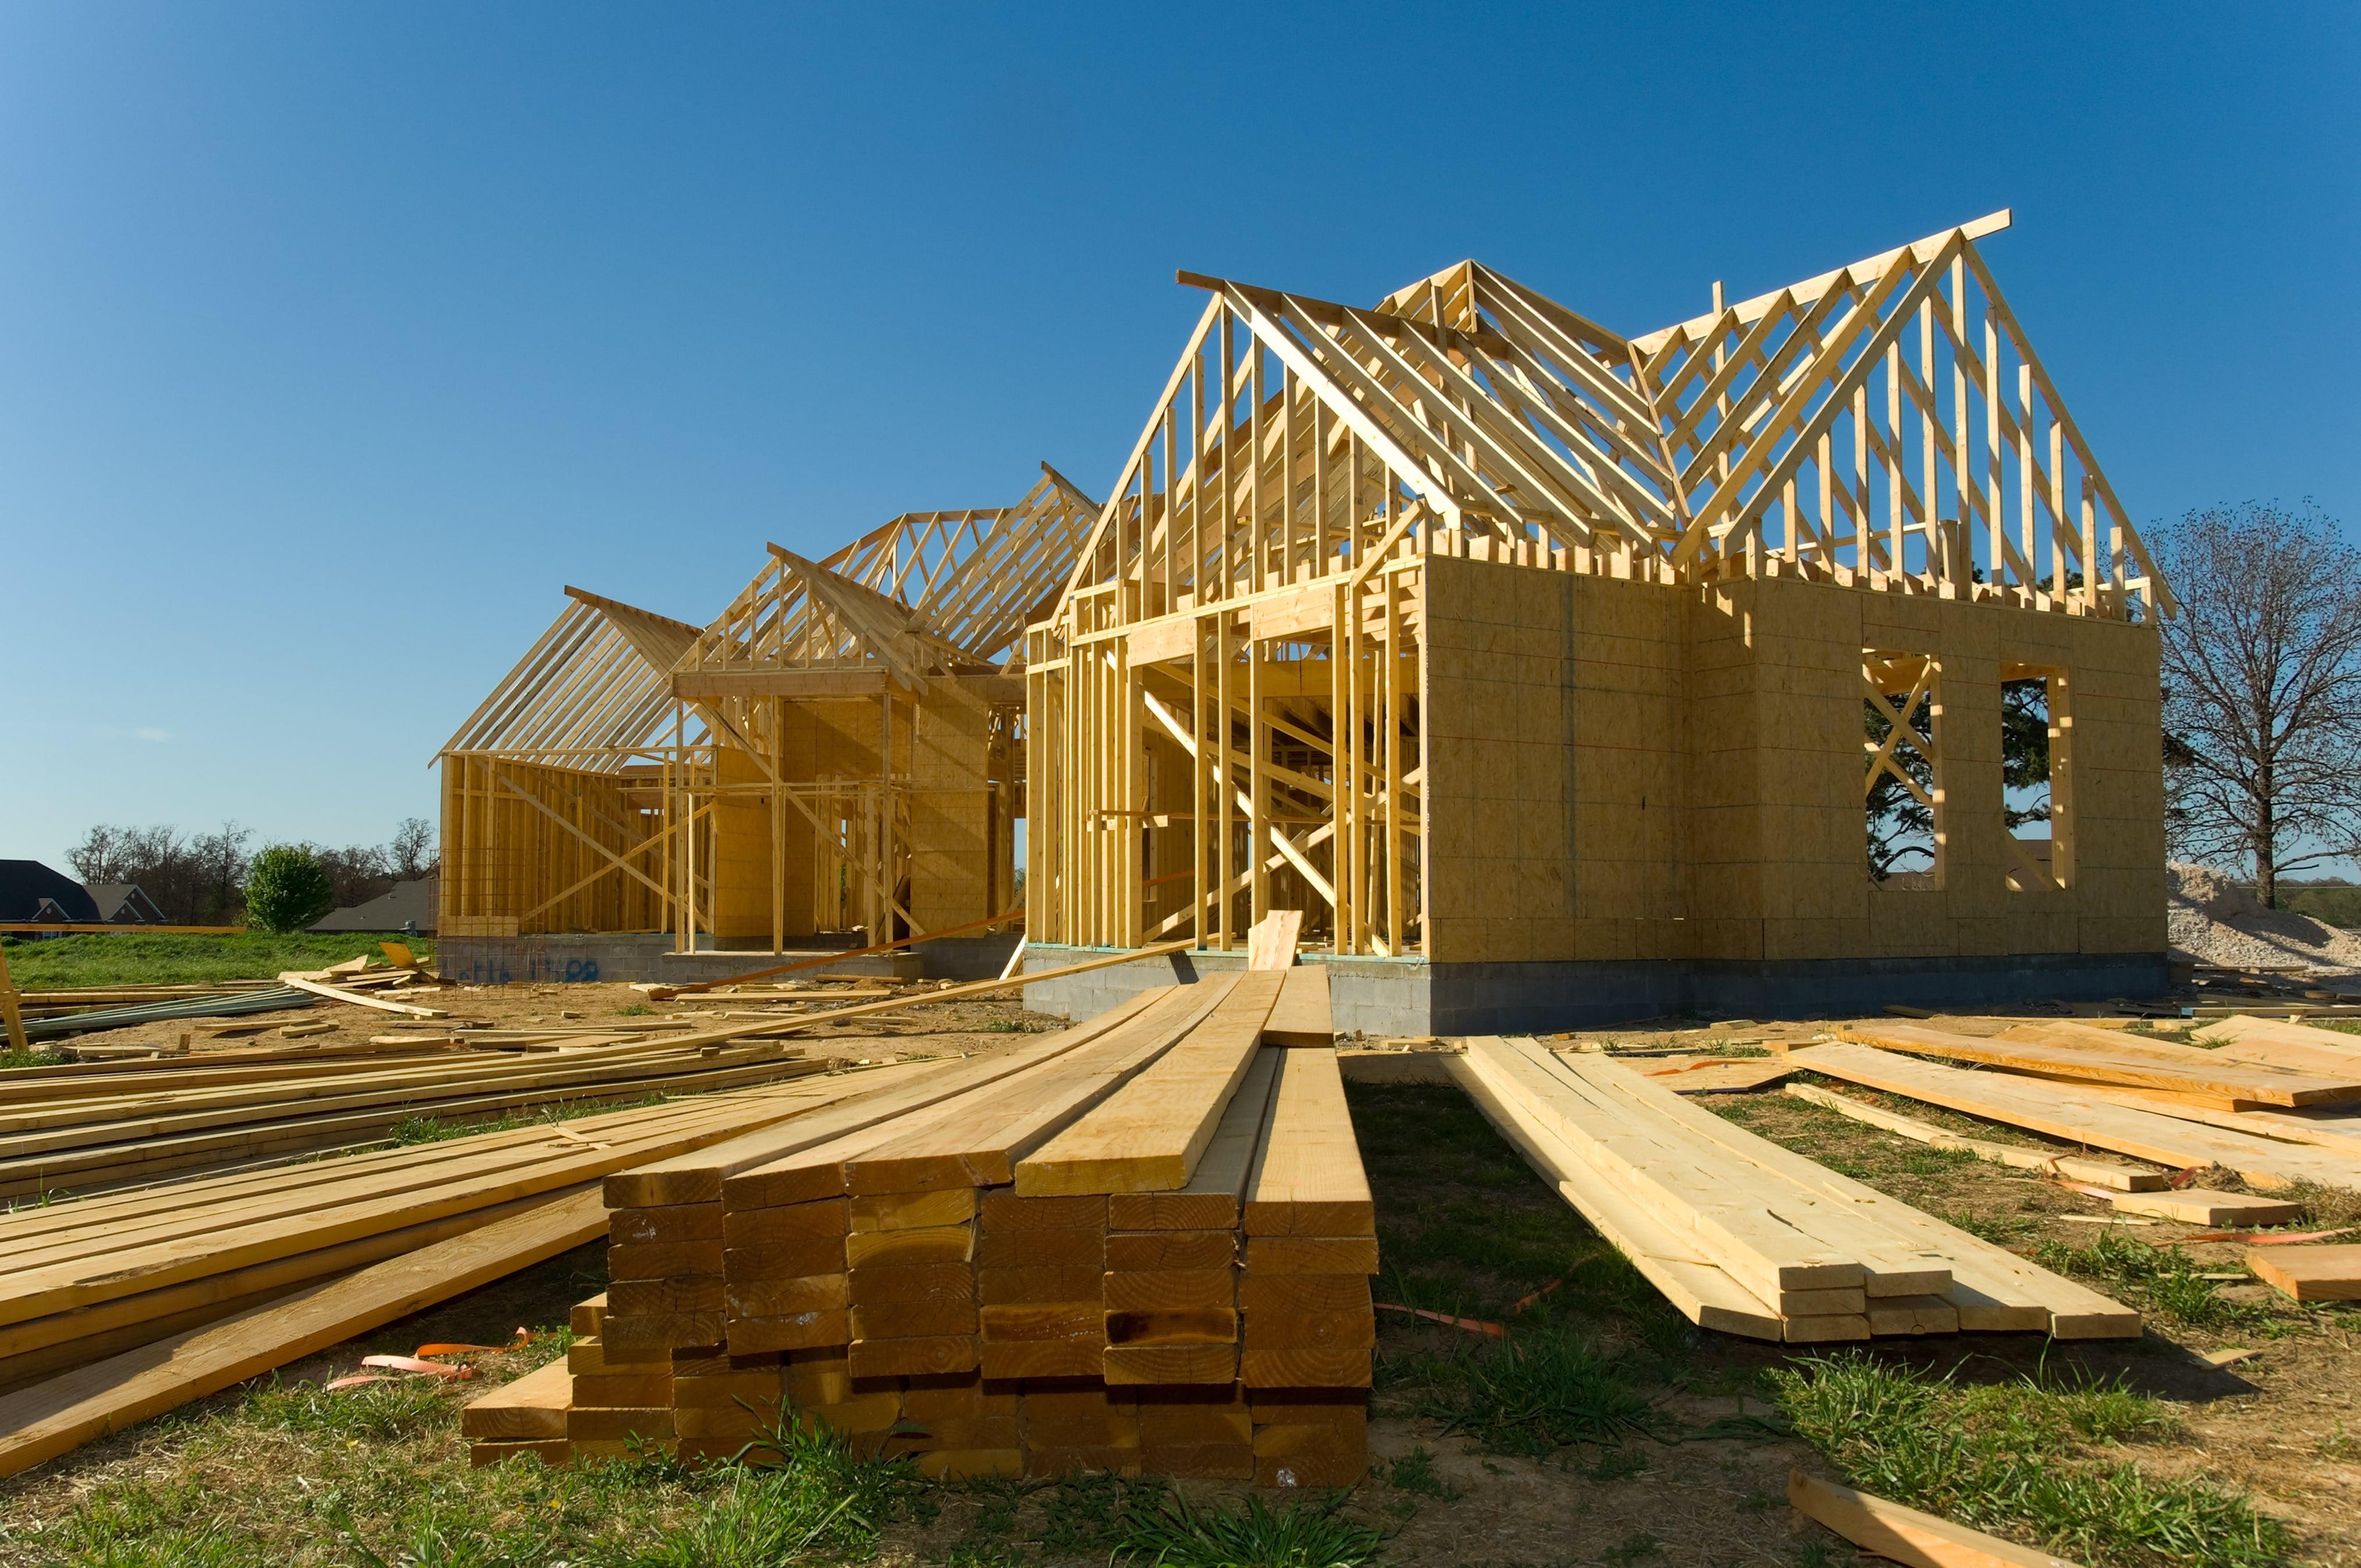 Custom Home, Building, Wood